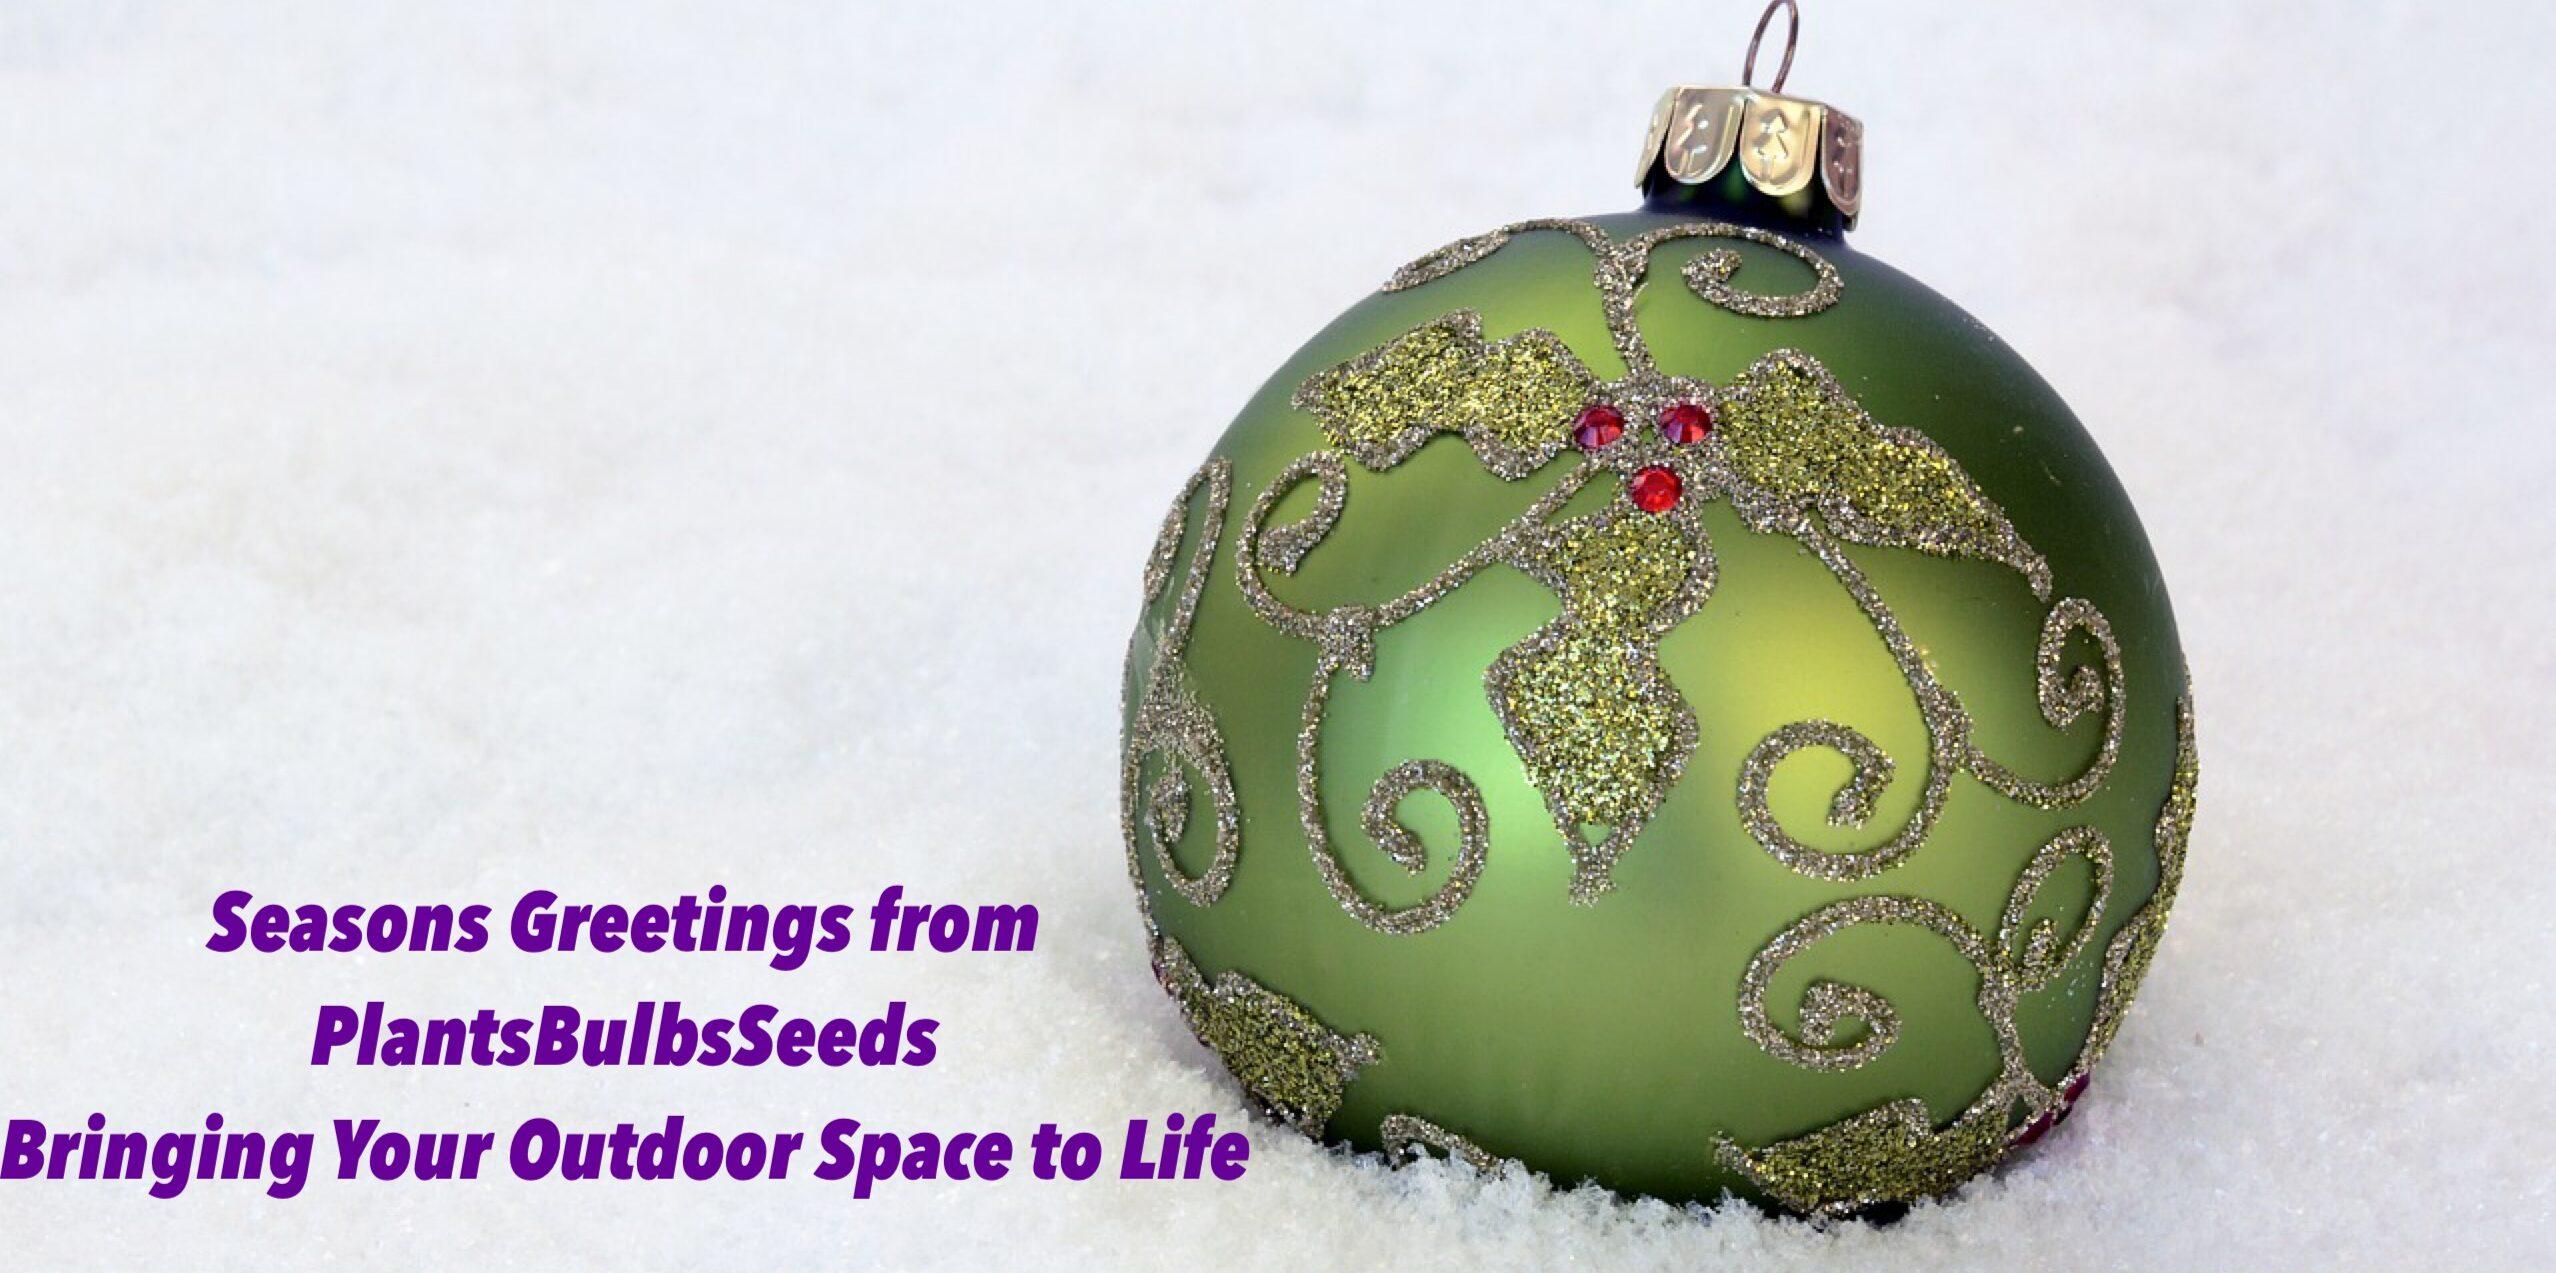 Plants Bulbs Seeds